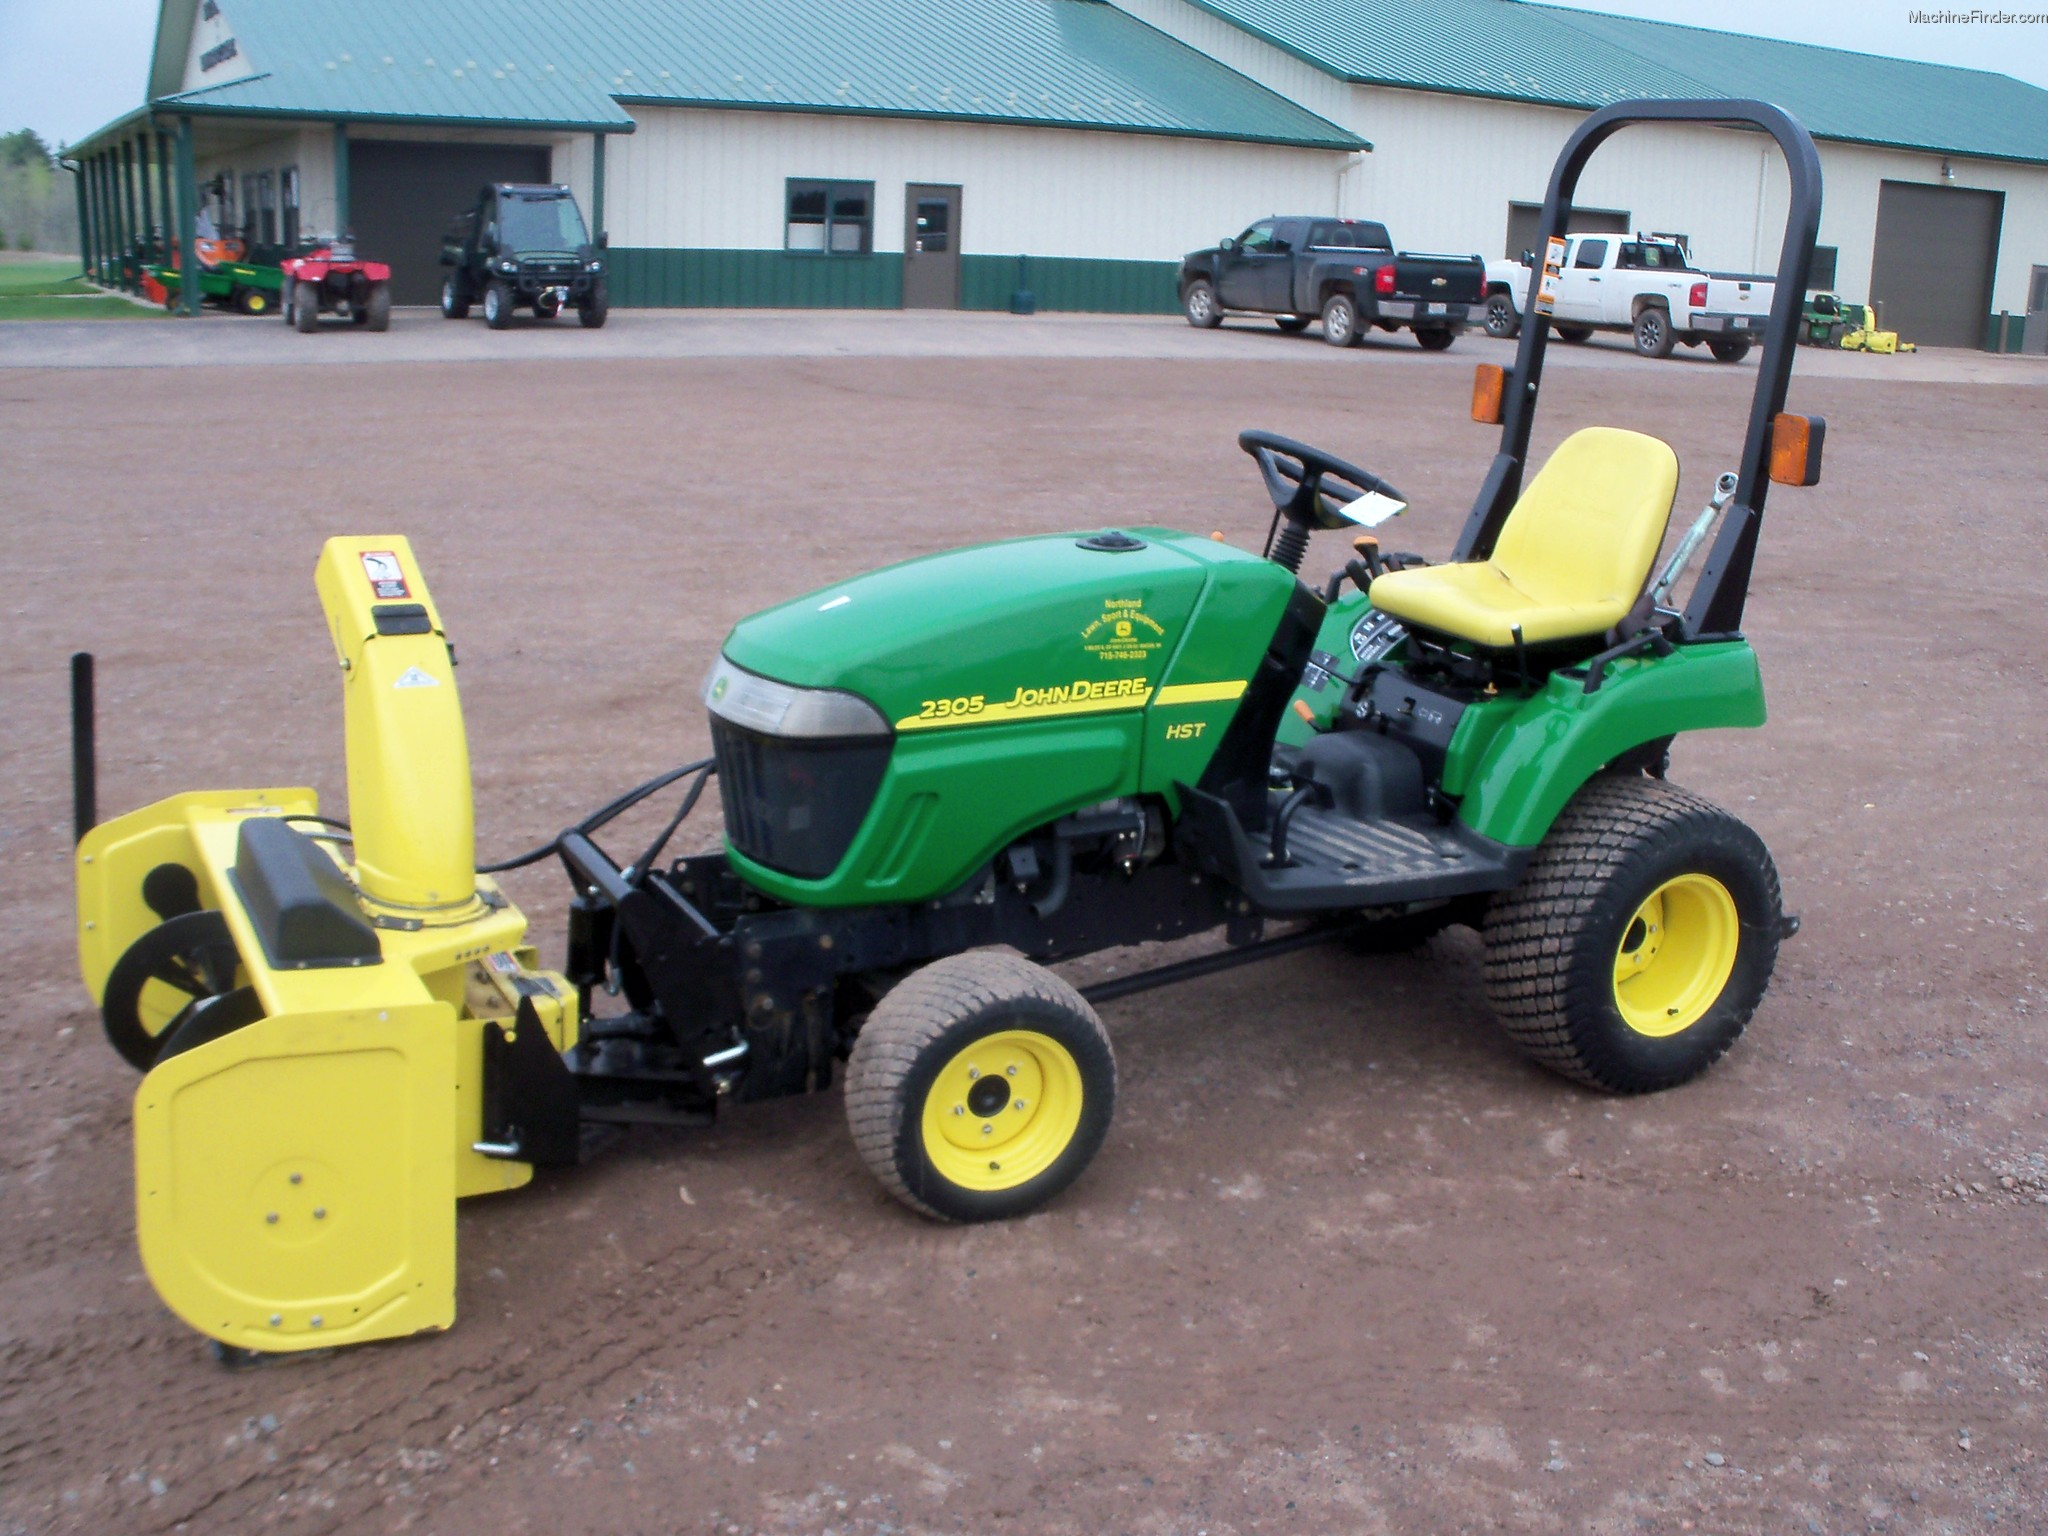 2007 John Deere 2305 Tractors - Compact (1-40hp.) - John ...